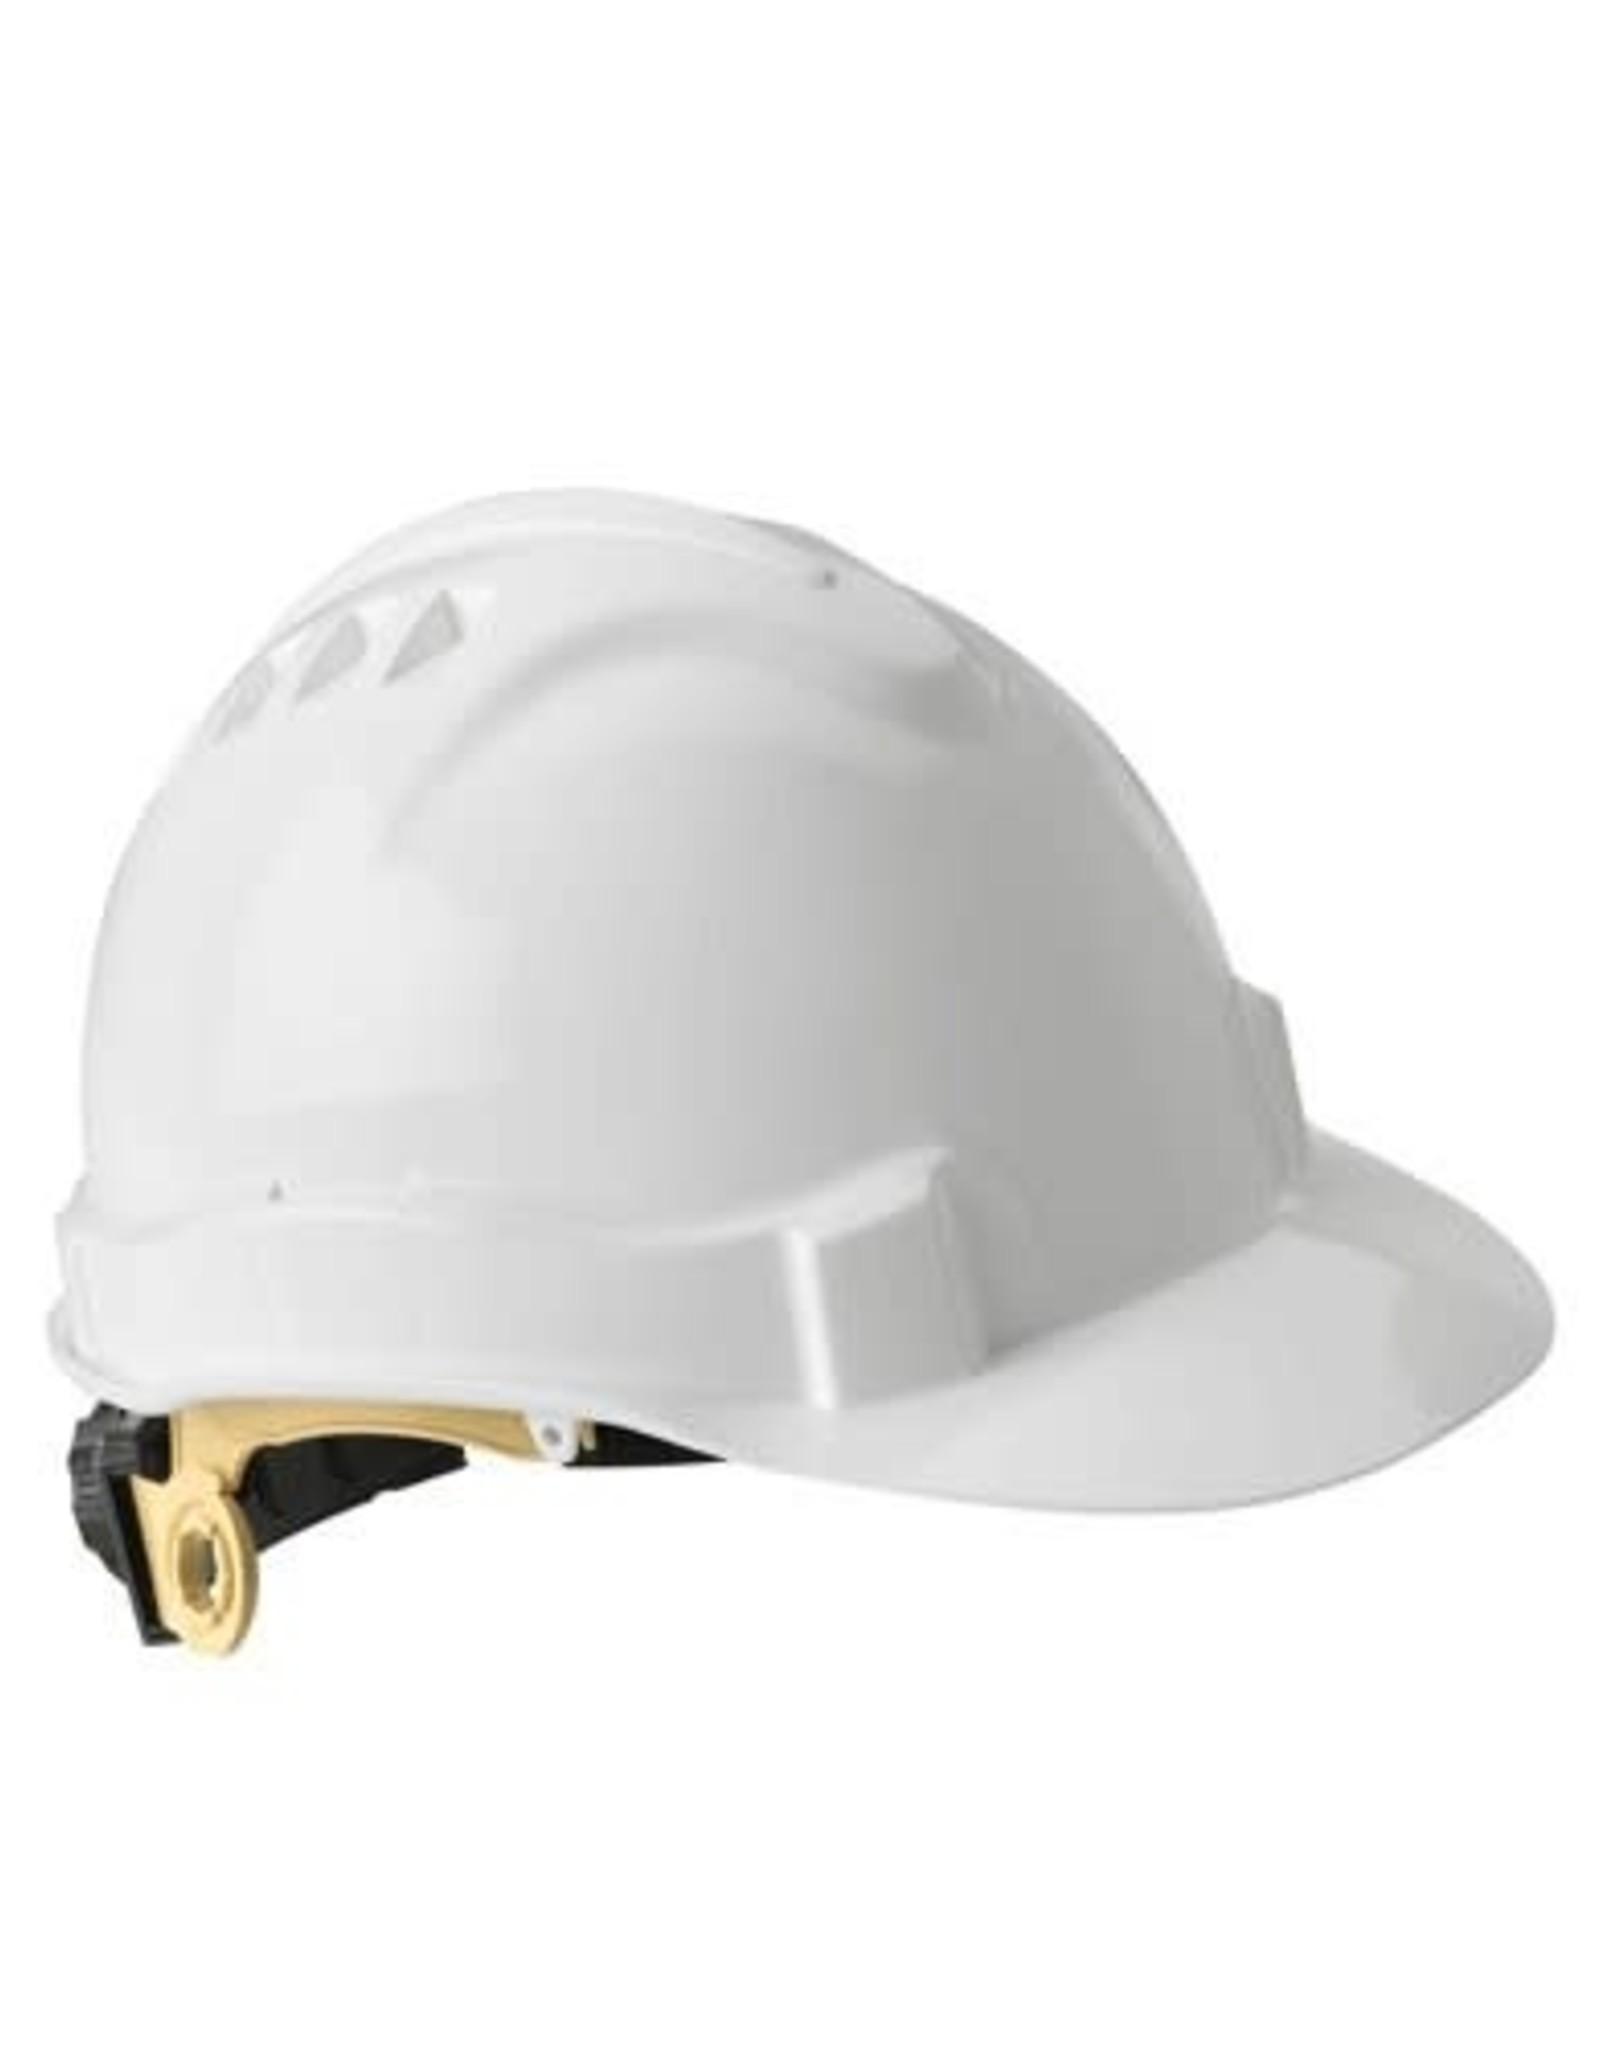 Standard Safety Helmet, Ratchet Suspension, White Shell